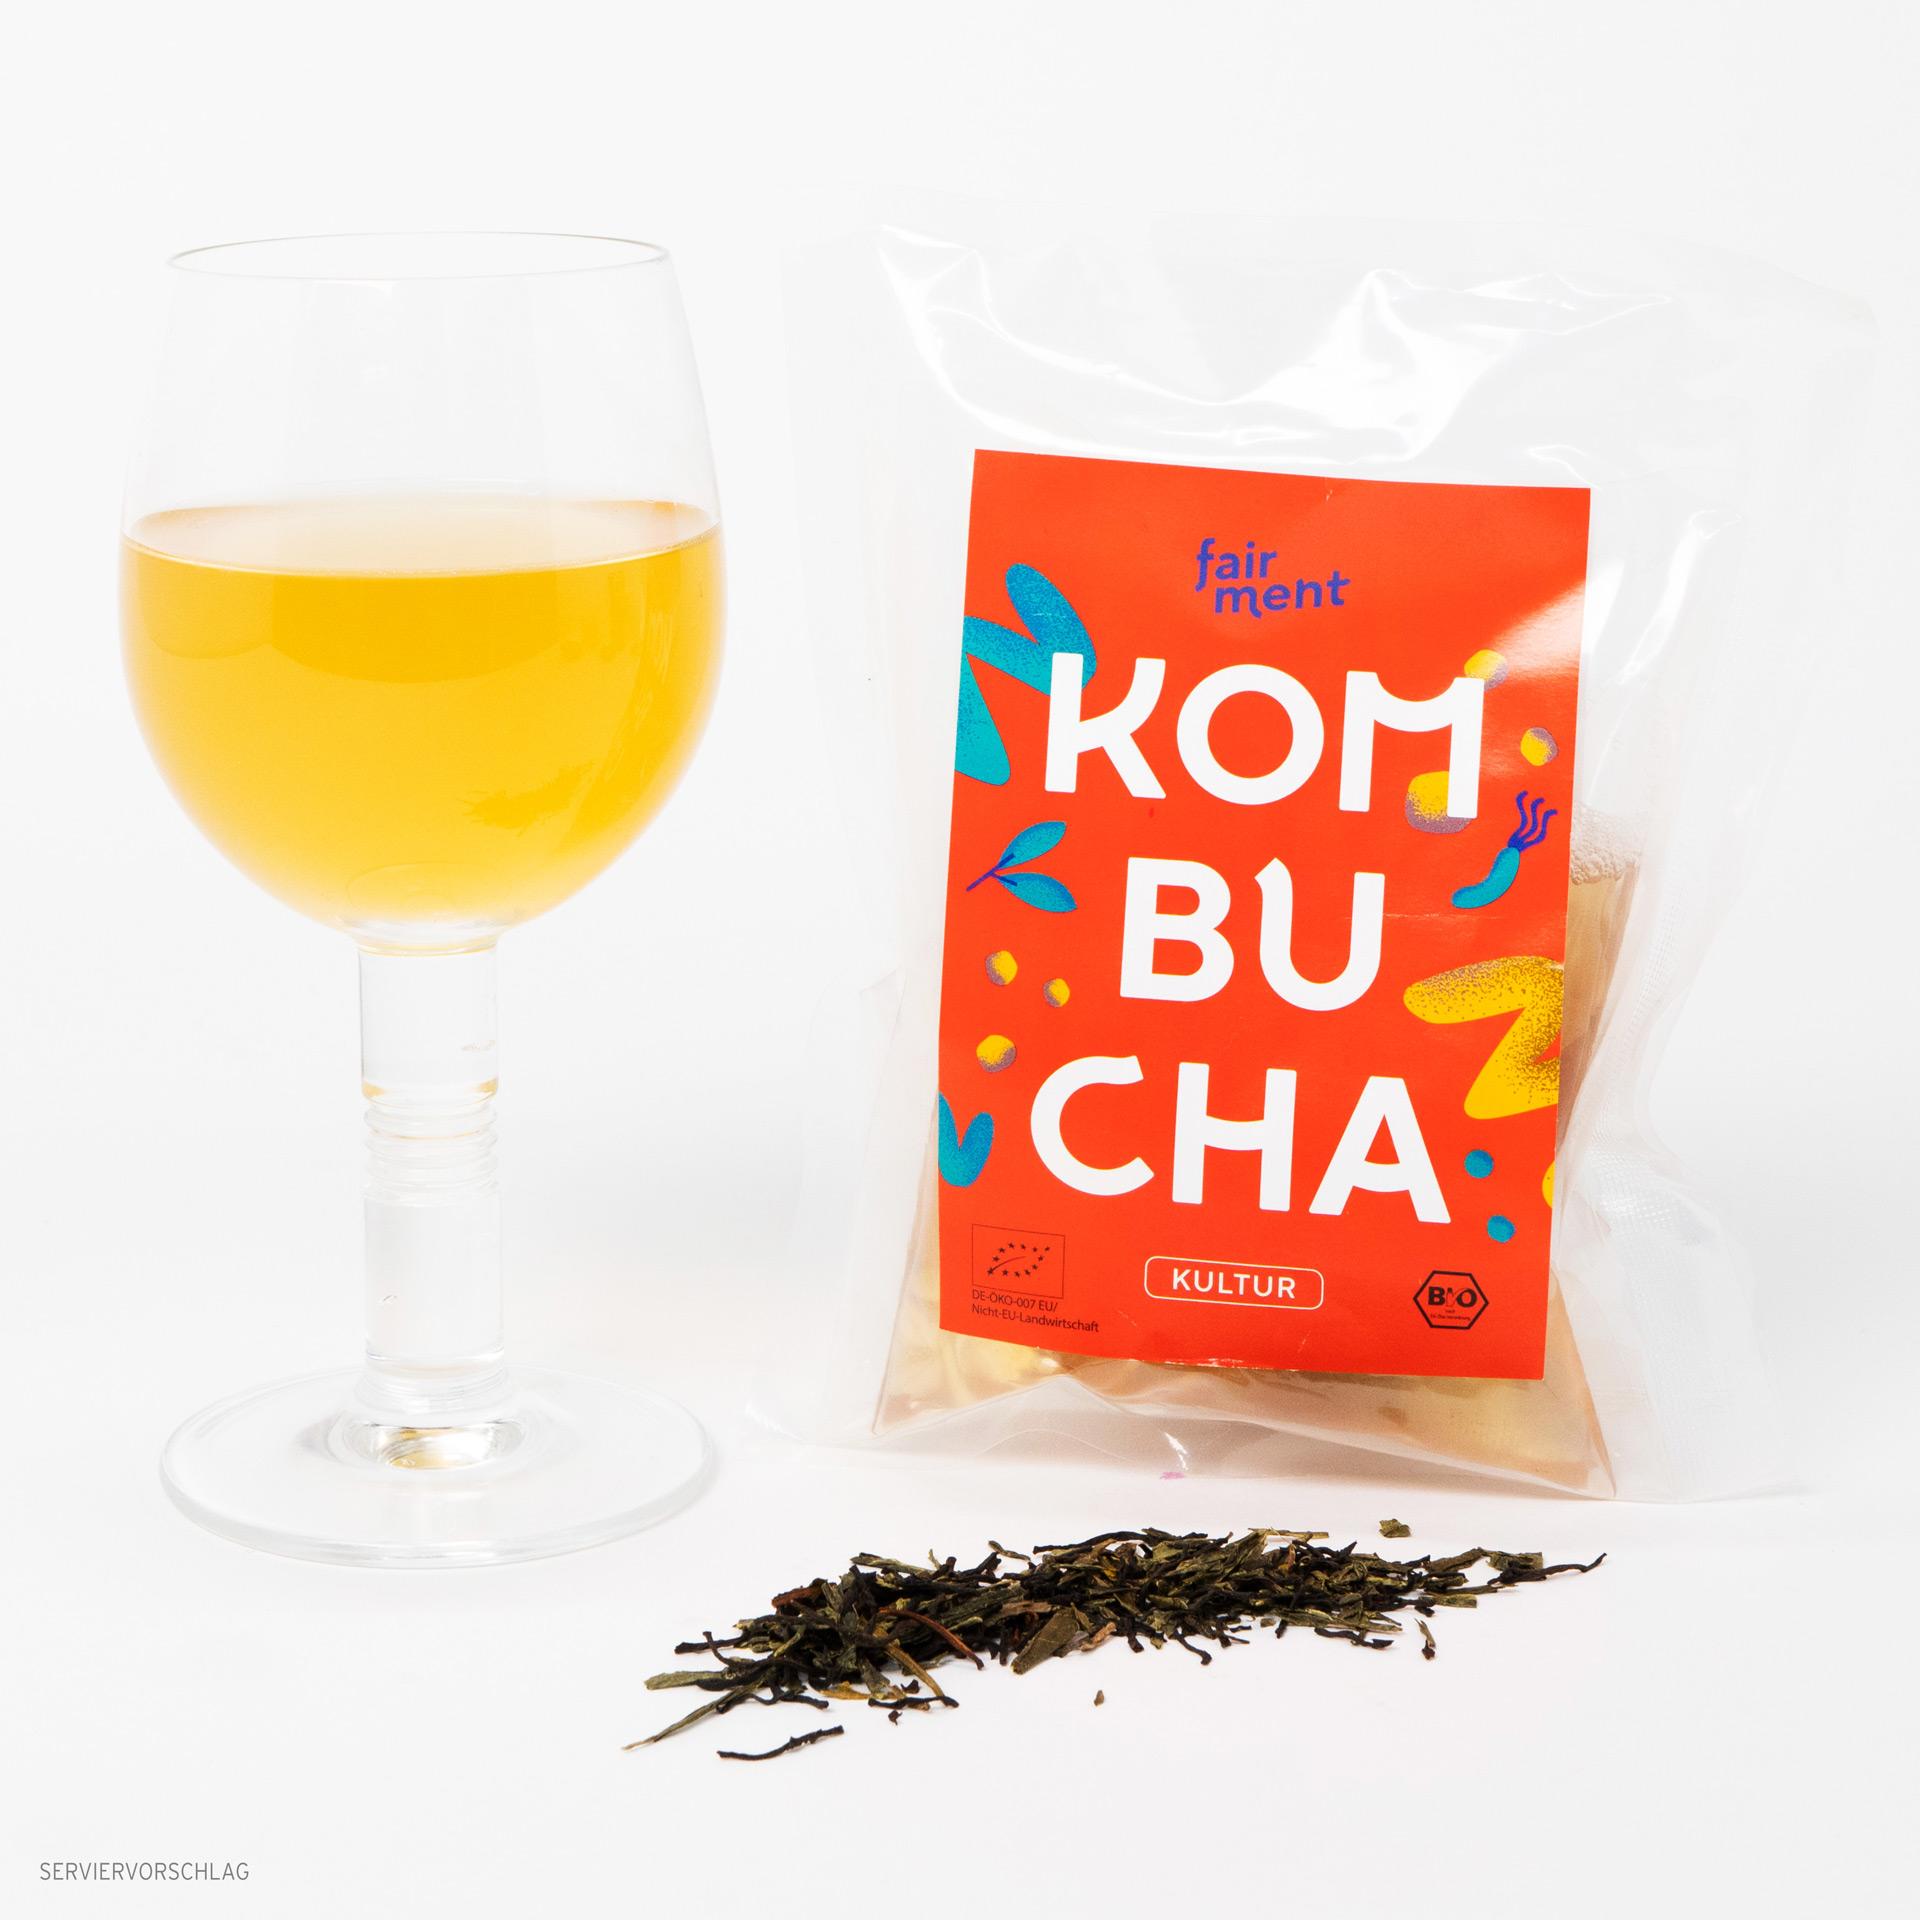 Fairment Kombucha Teepilz mit fertigem Tee im Glas